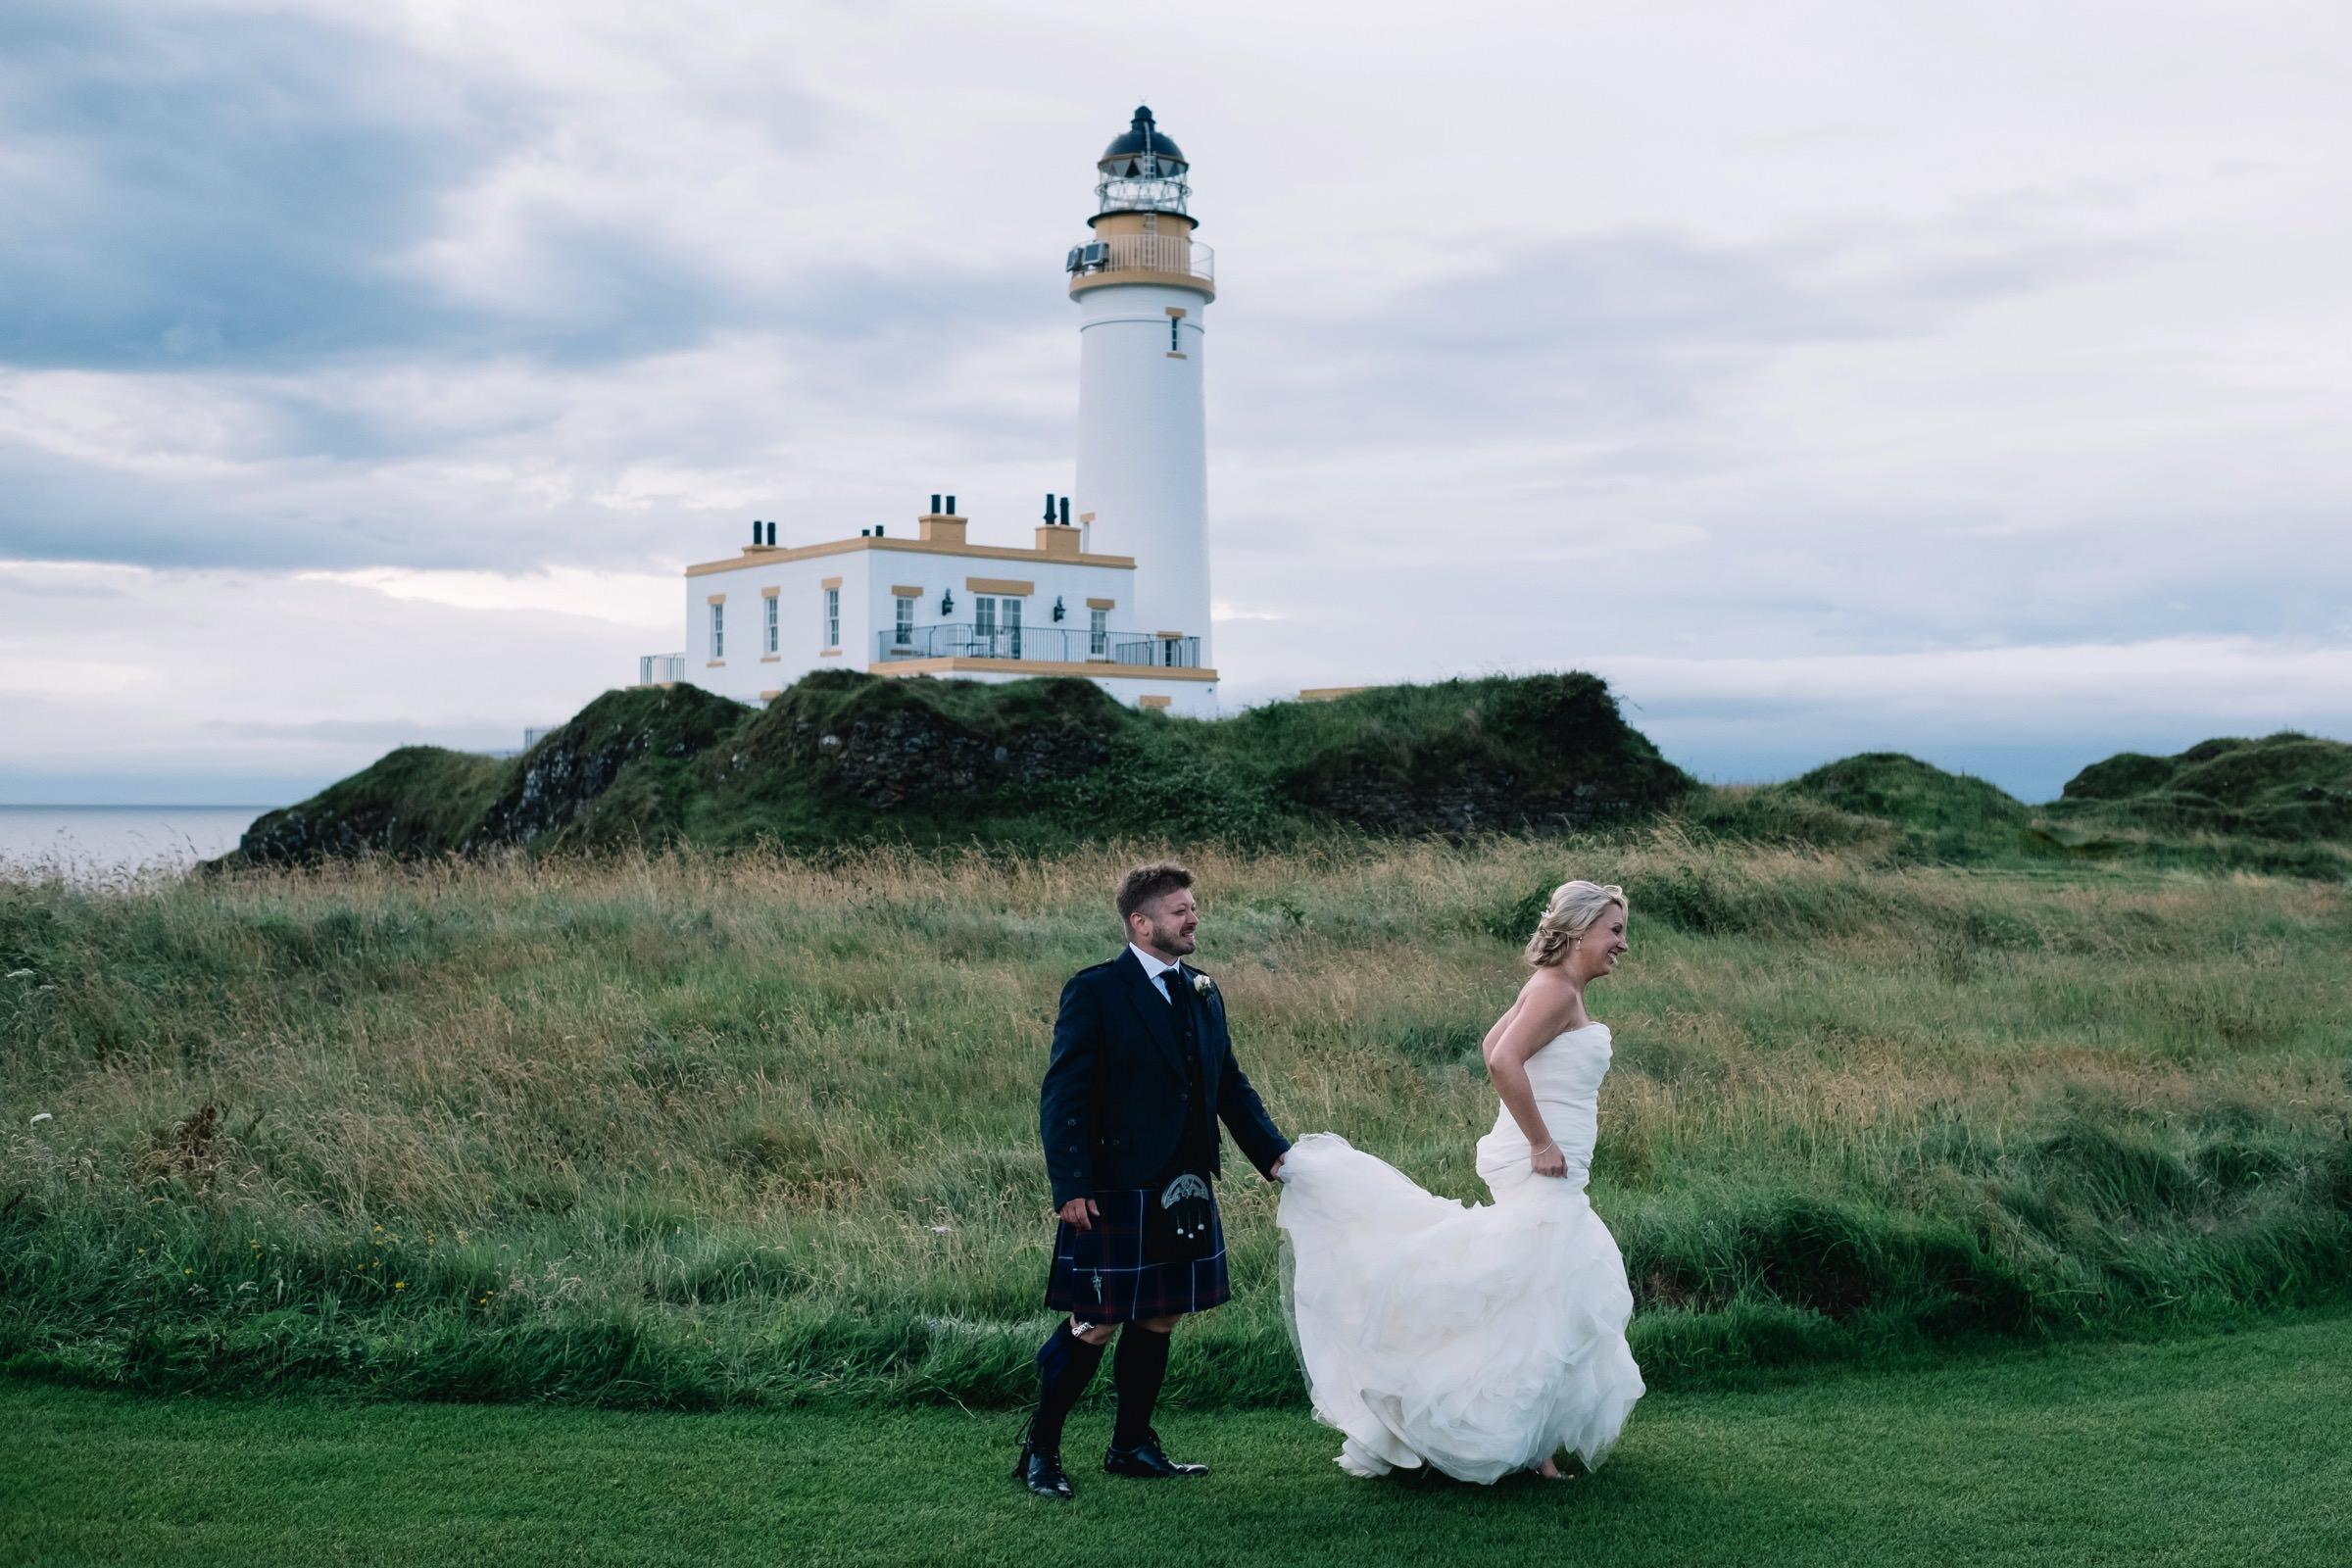 Bride and groom walk